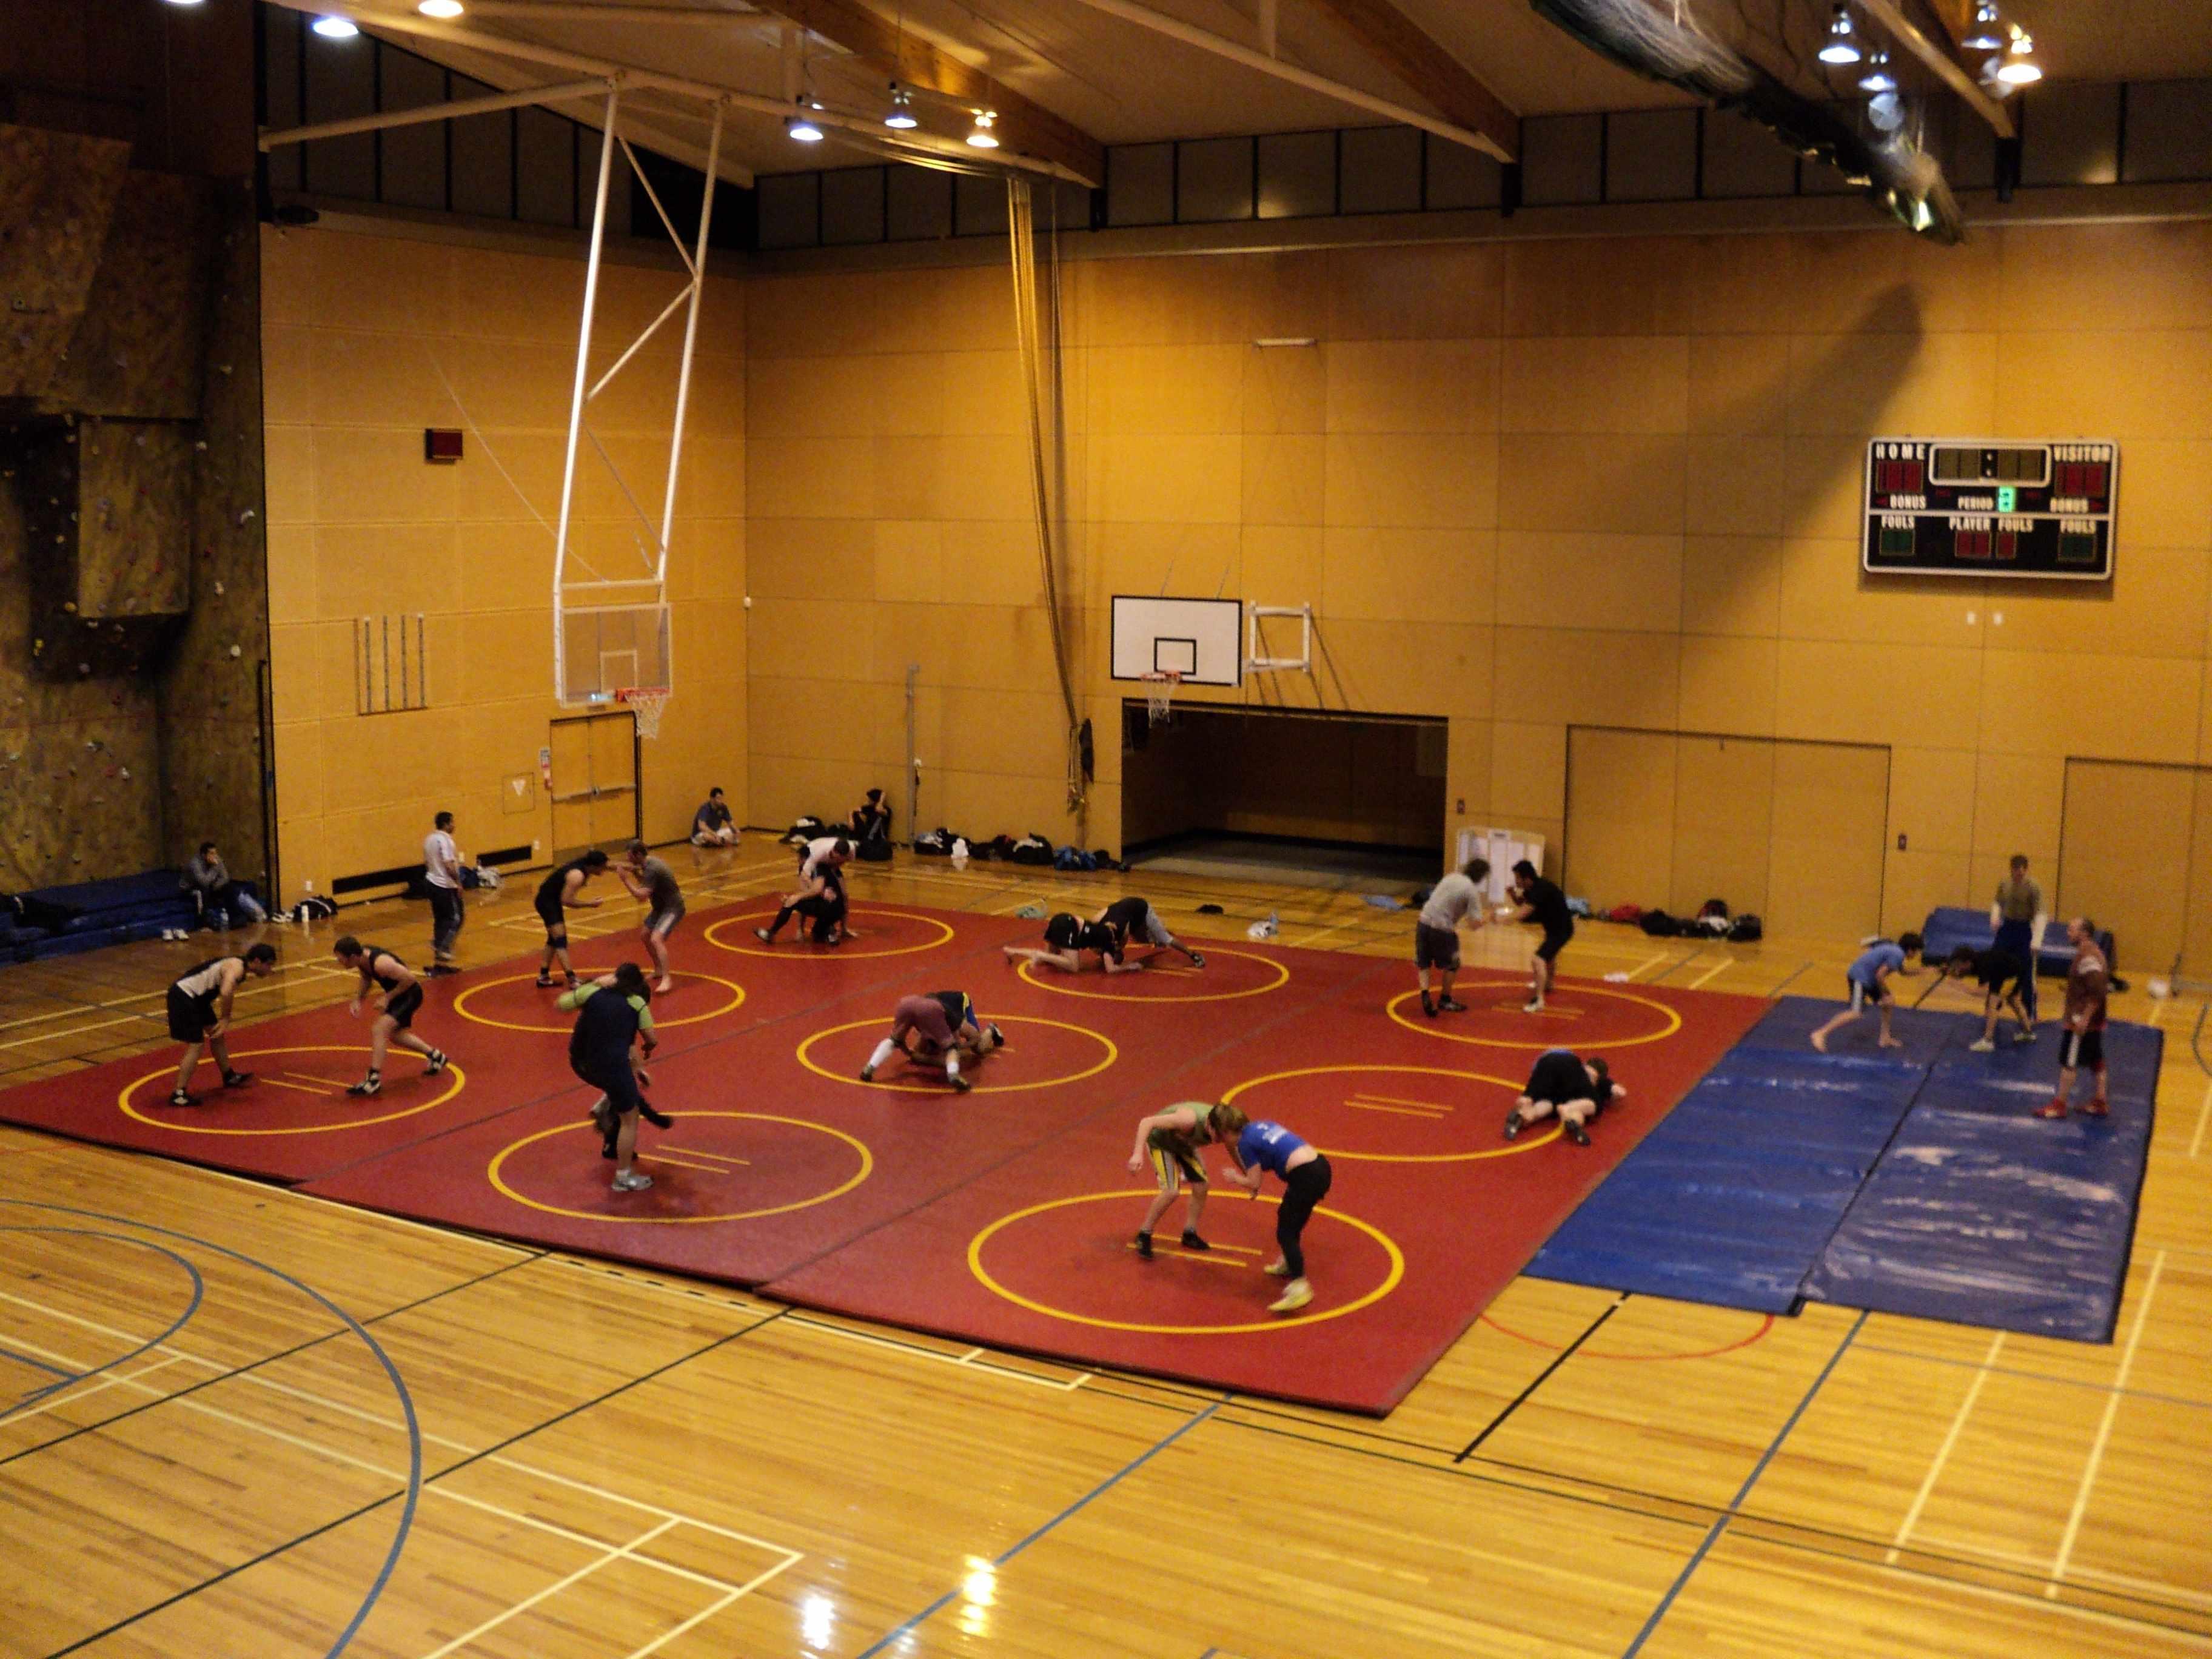 Dilworth Grizzlies Wrestling Club - New Zealand: Training venue